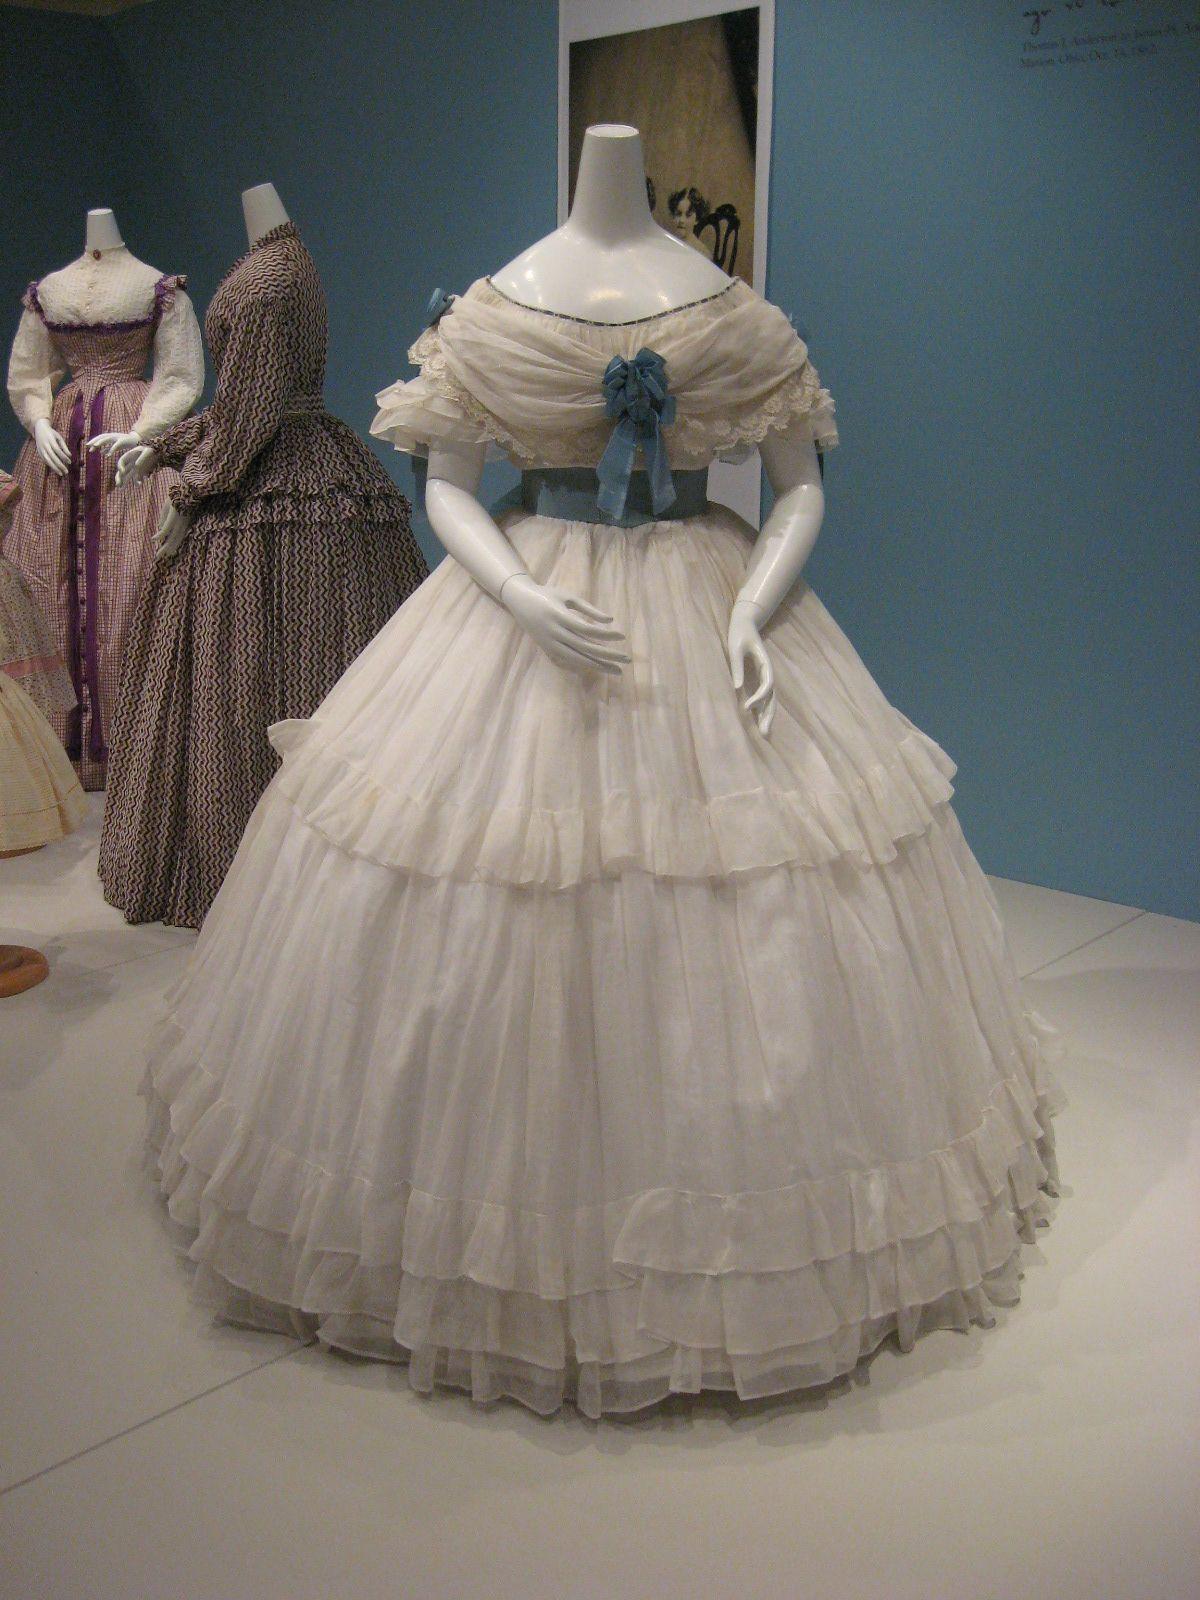 Sheer white cotton dress with blue satin sash french circa